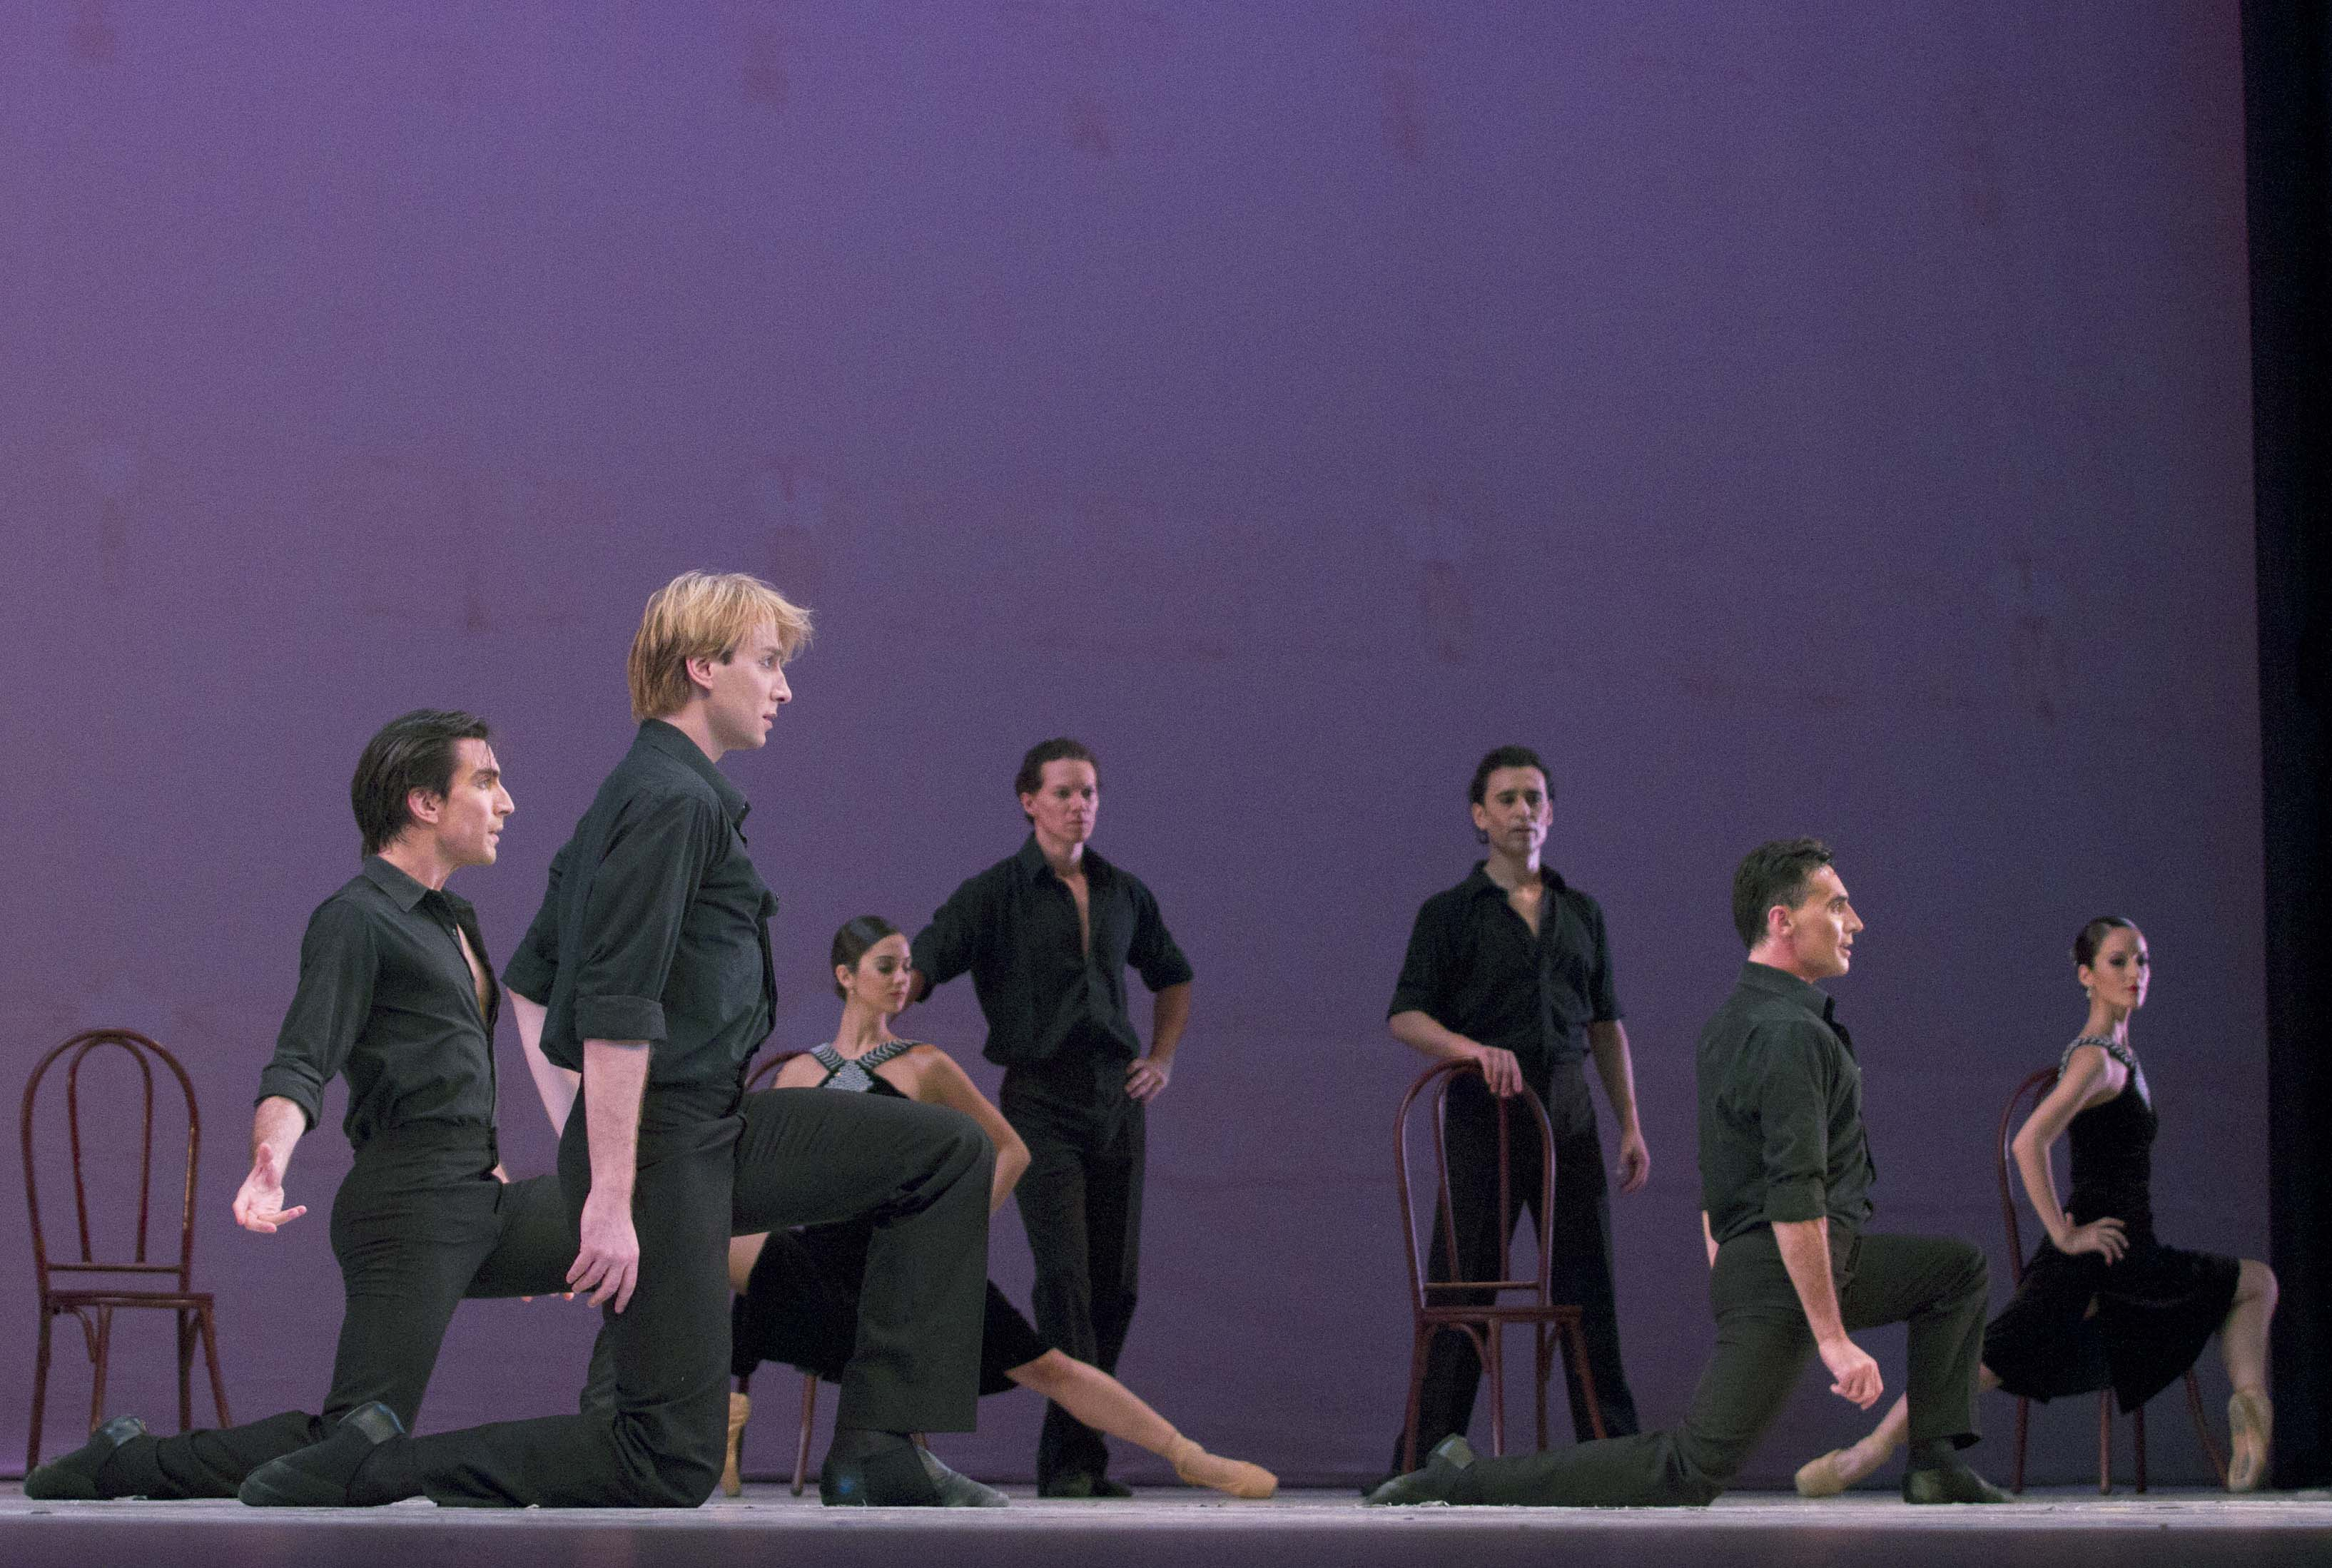 """Tango"", a cargo del grupo que representó al Ballet Estable del Teatro Colón. Foto: Alicia Sanguinetti."